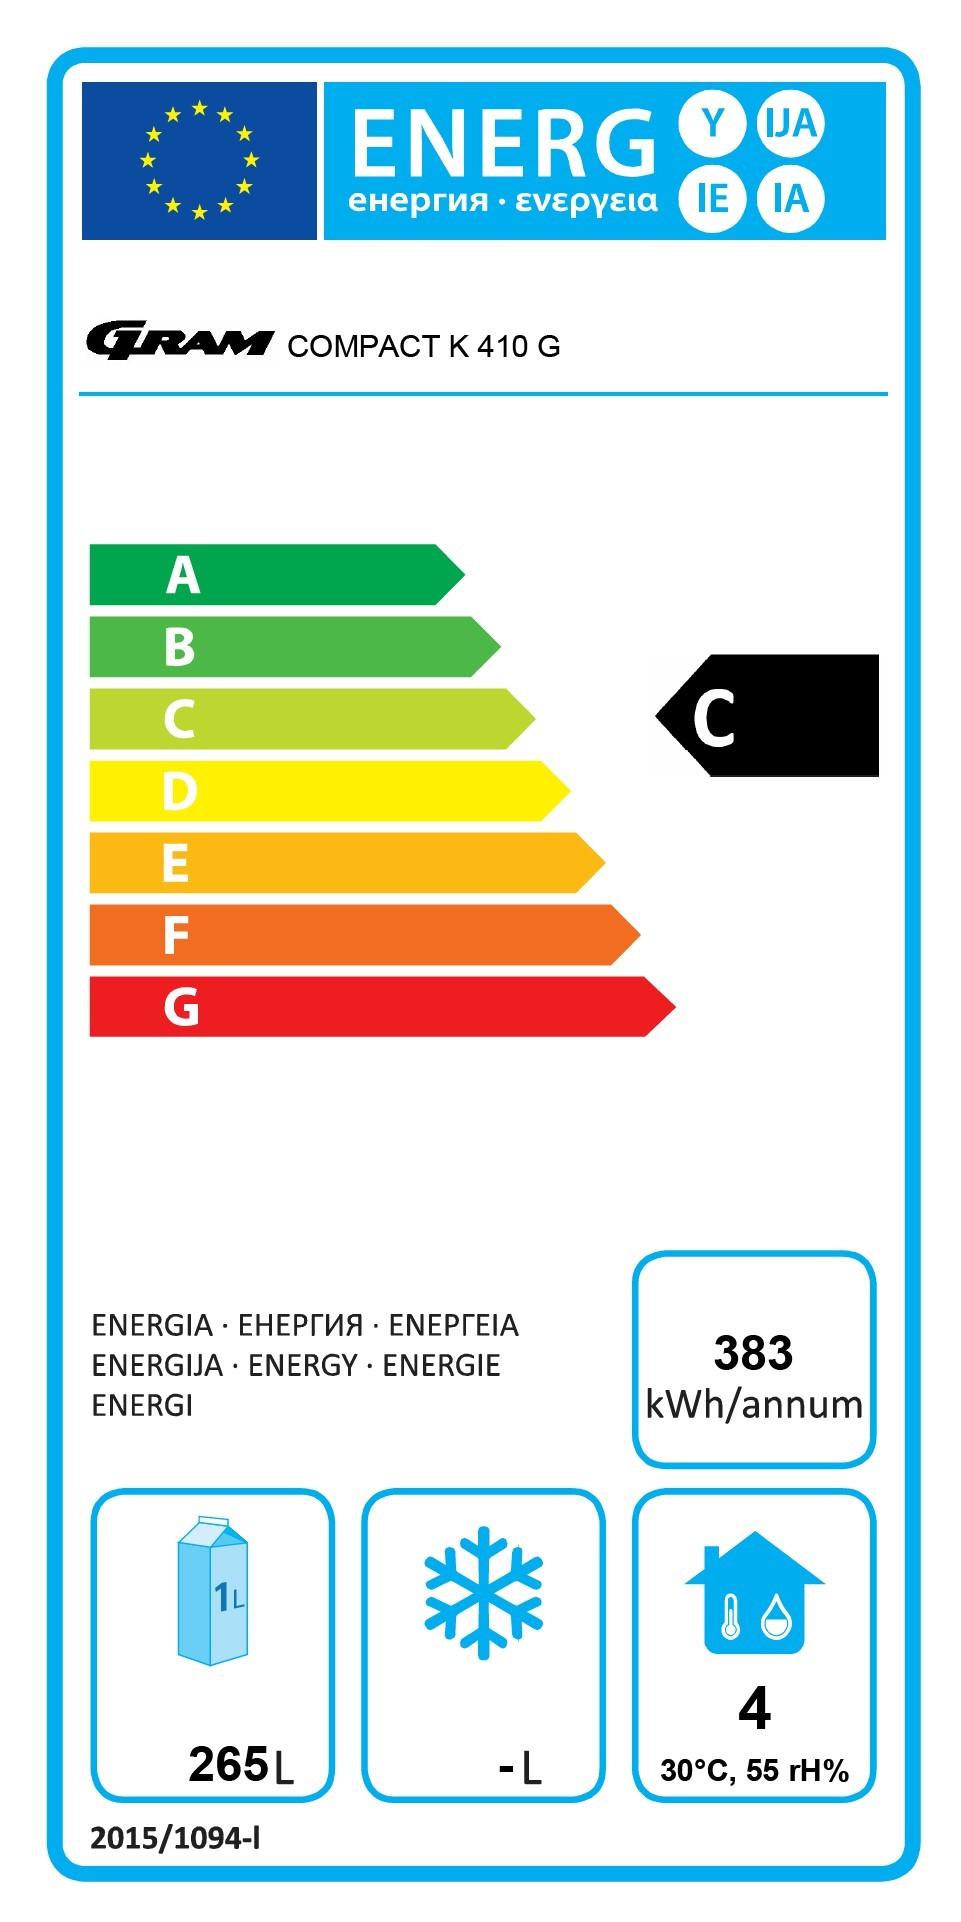 COMPACT KG 420 RG C 6W 346 Ltr Glass Door Display Fridge Energy Rating